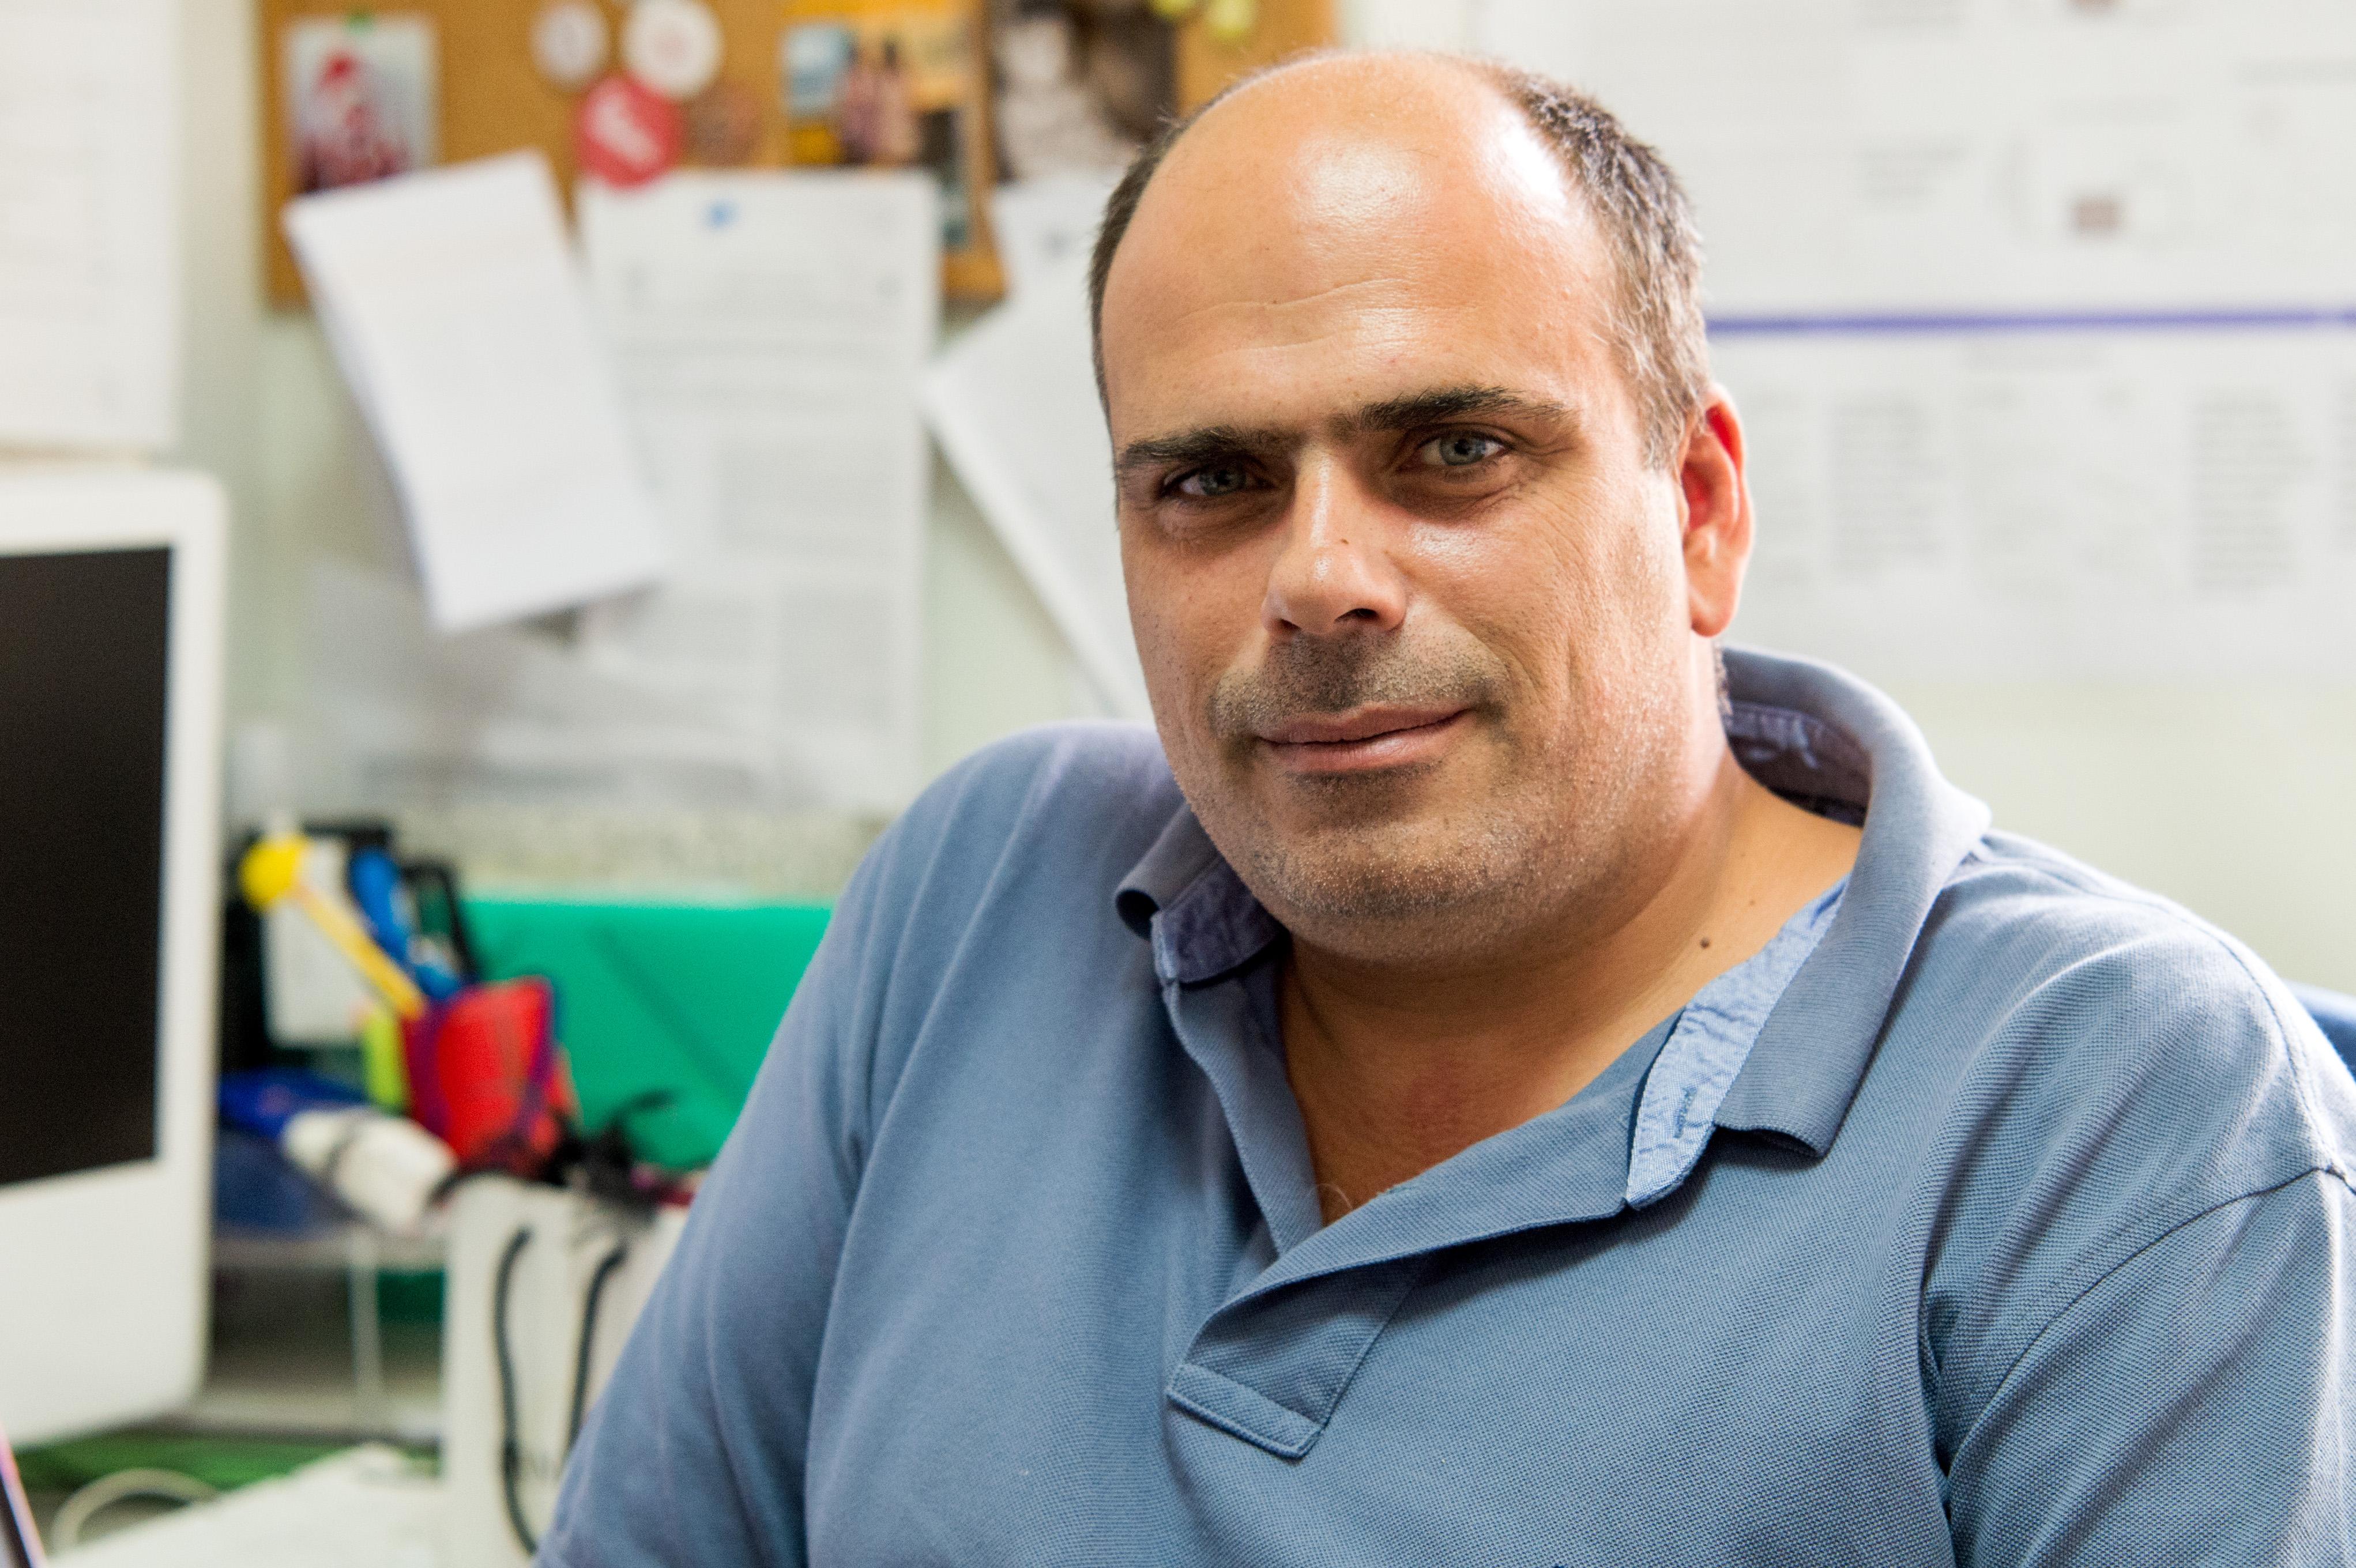 Antonio Oliviero IP Grupo FENNSI Hospital Nacional de Parapléjicos